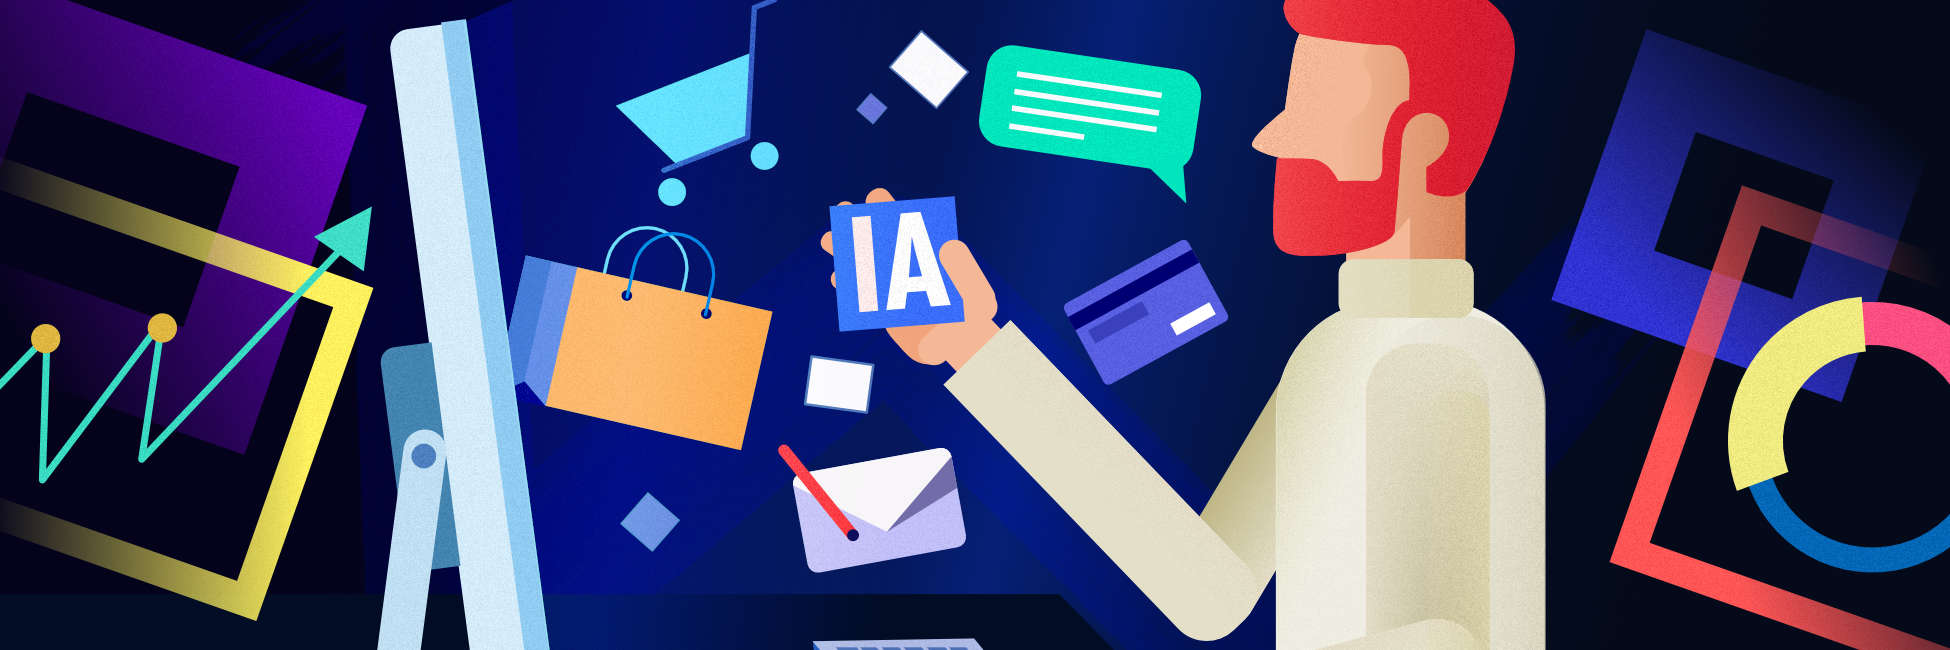 Artificial intelligence enables digital advertising